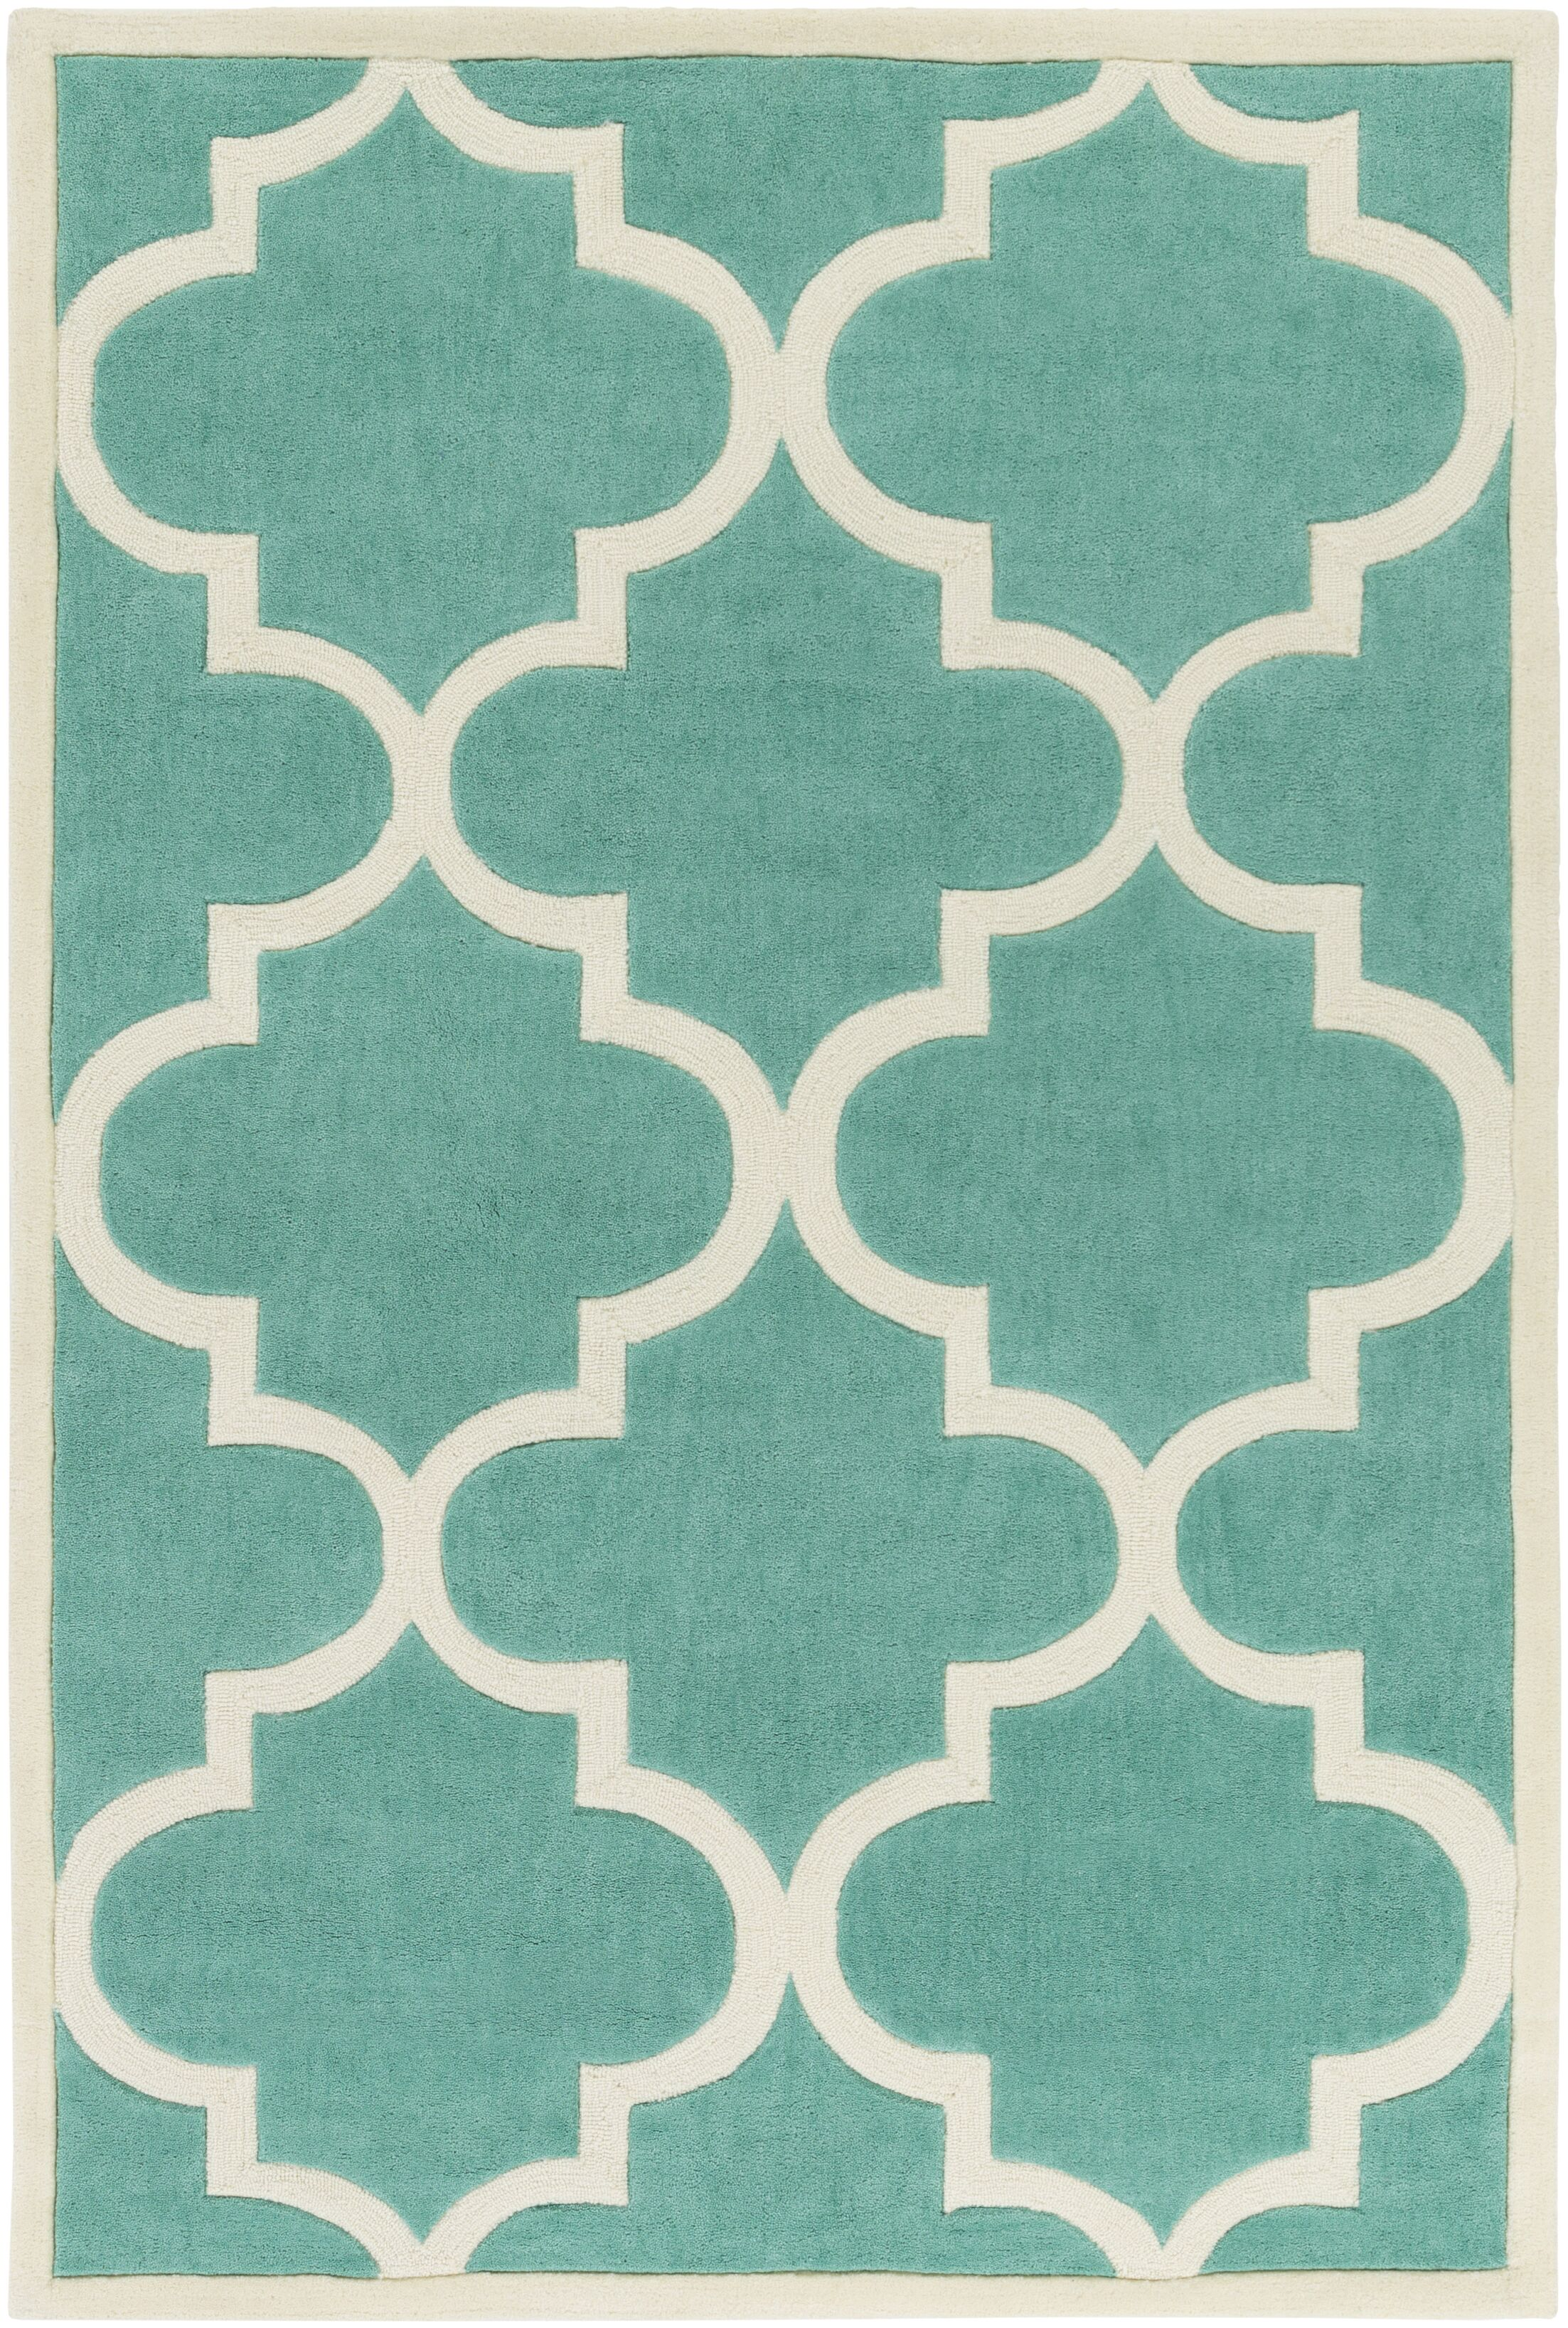 Daubert Hand-Tufted Emerald Area Rug Rug Size: Rectangle 8' x 11'